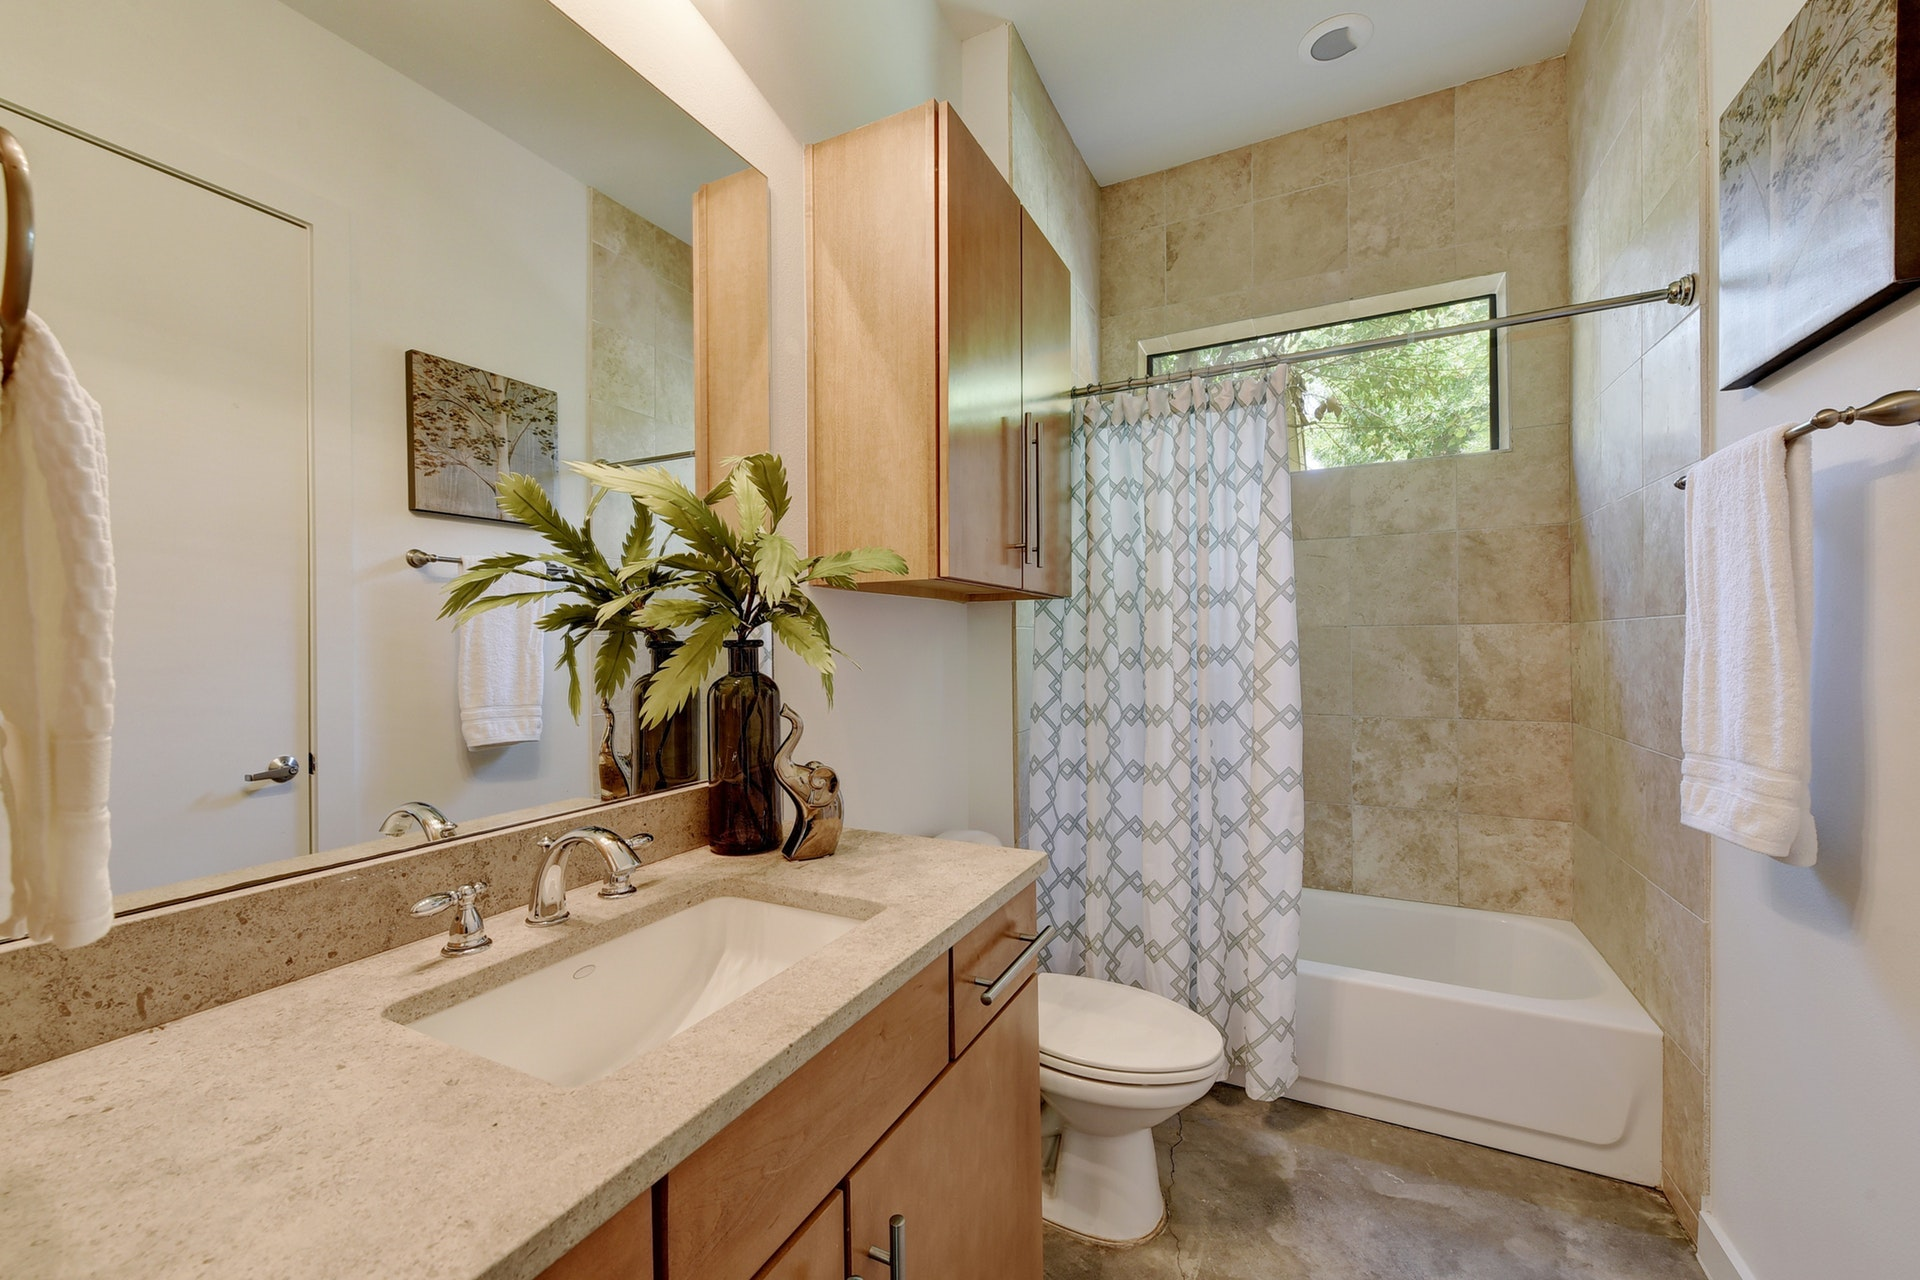 2618 Jefferson B - Upstairs Bathroom